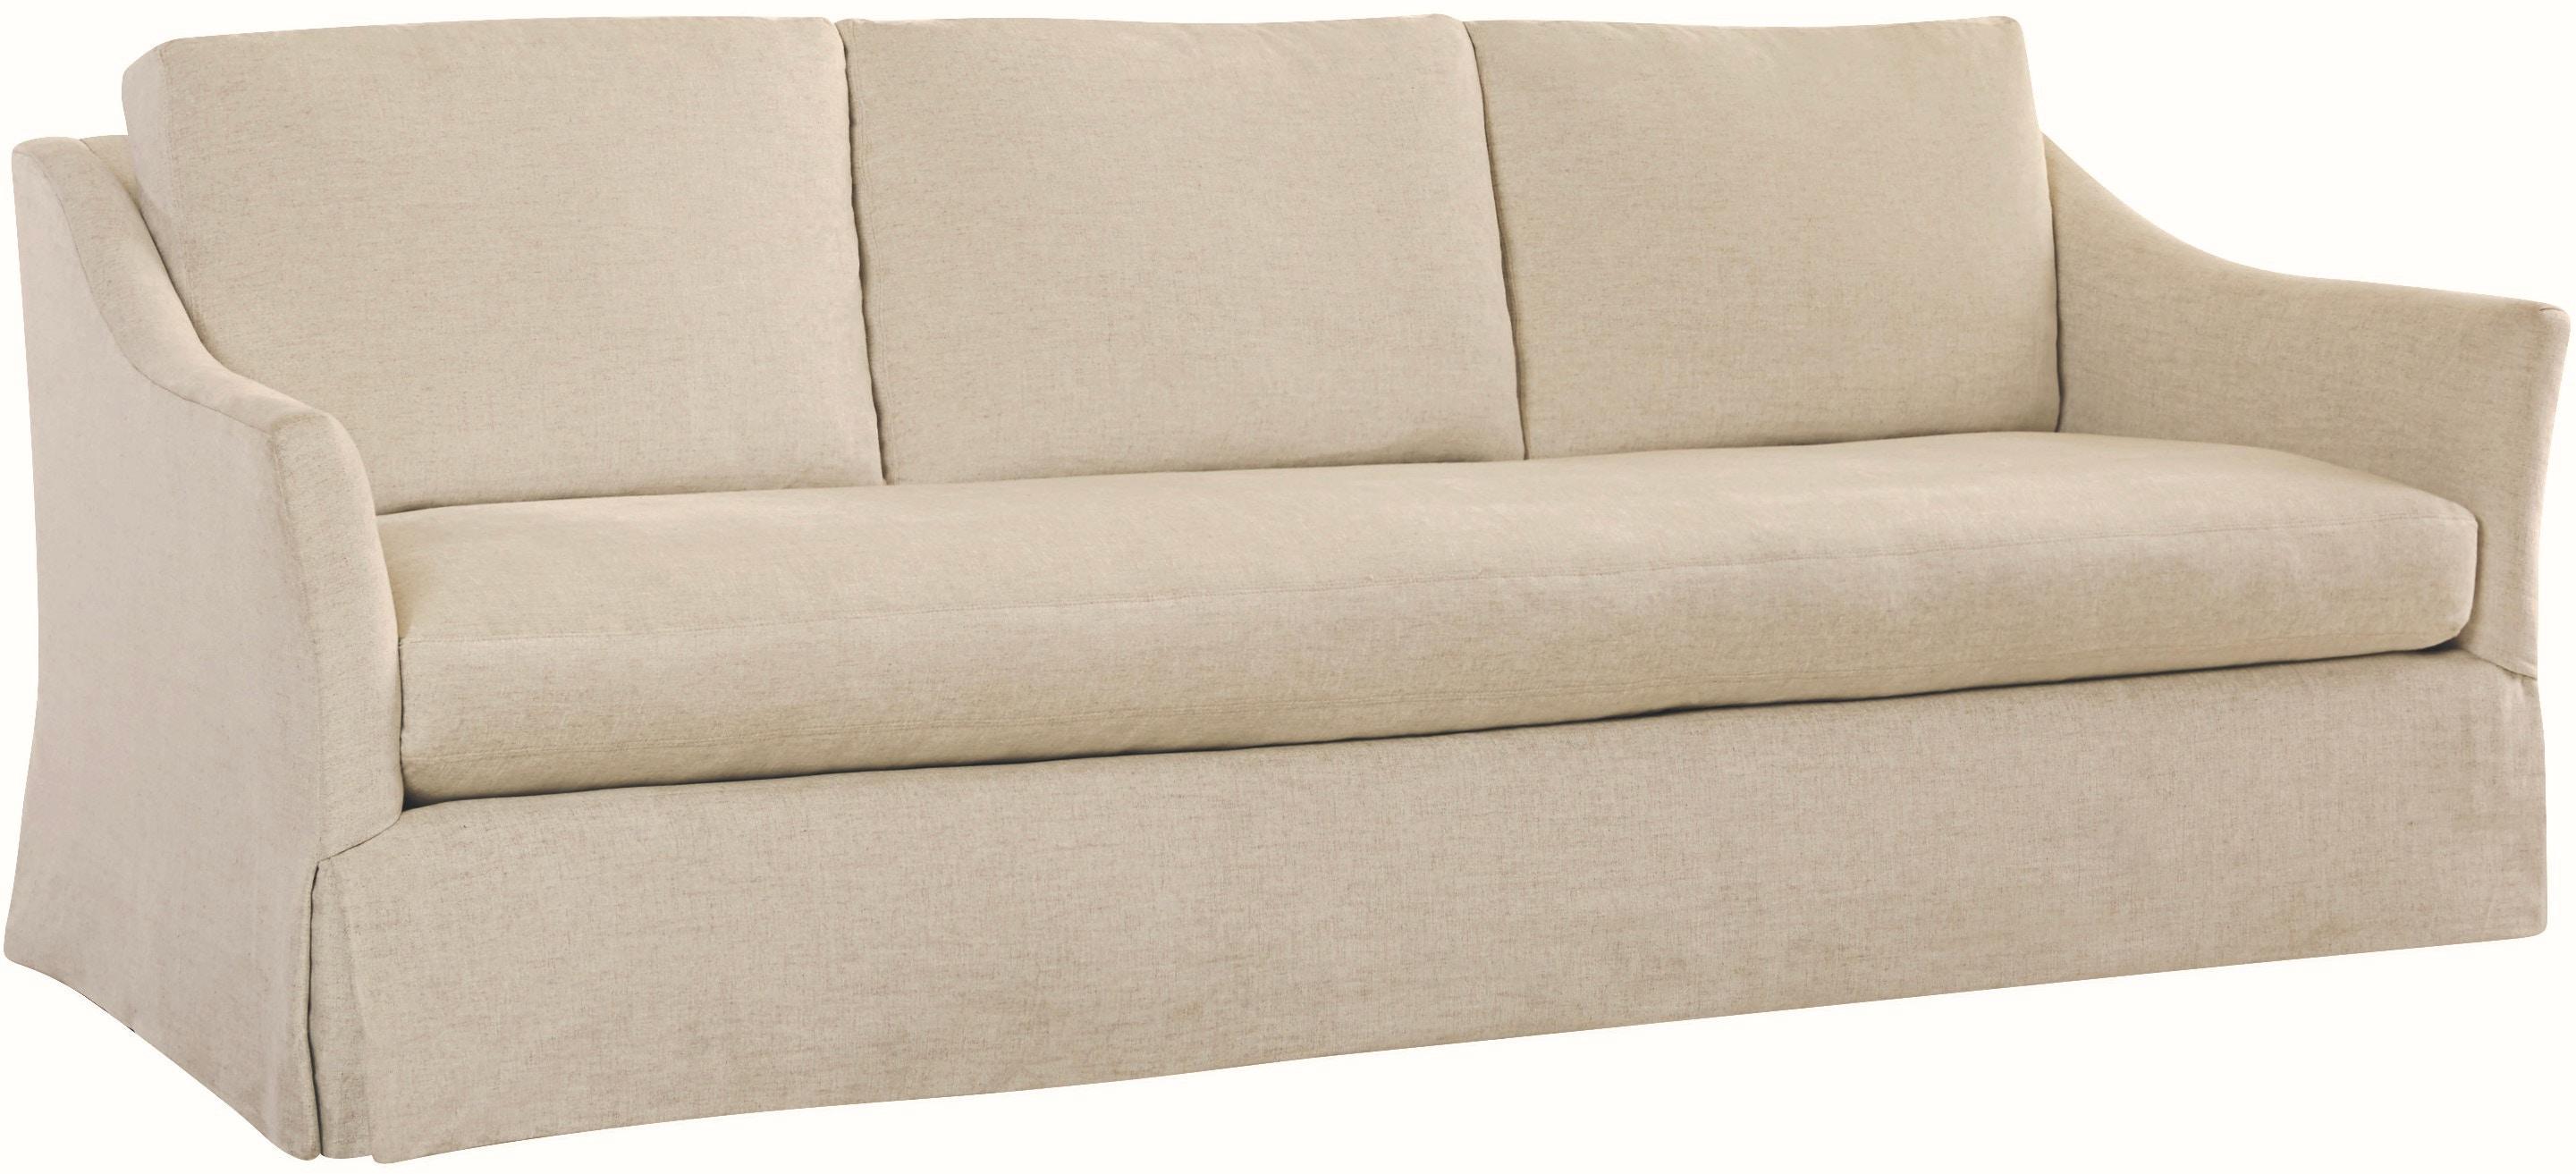 Lee Industries Living Room Sofa 3511 03 Oasis Rug Home  ~ Sofa Bed Jacksonville Fl